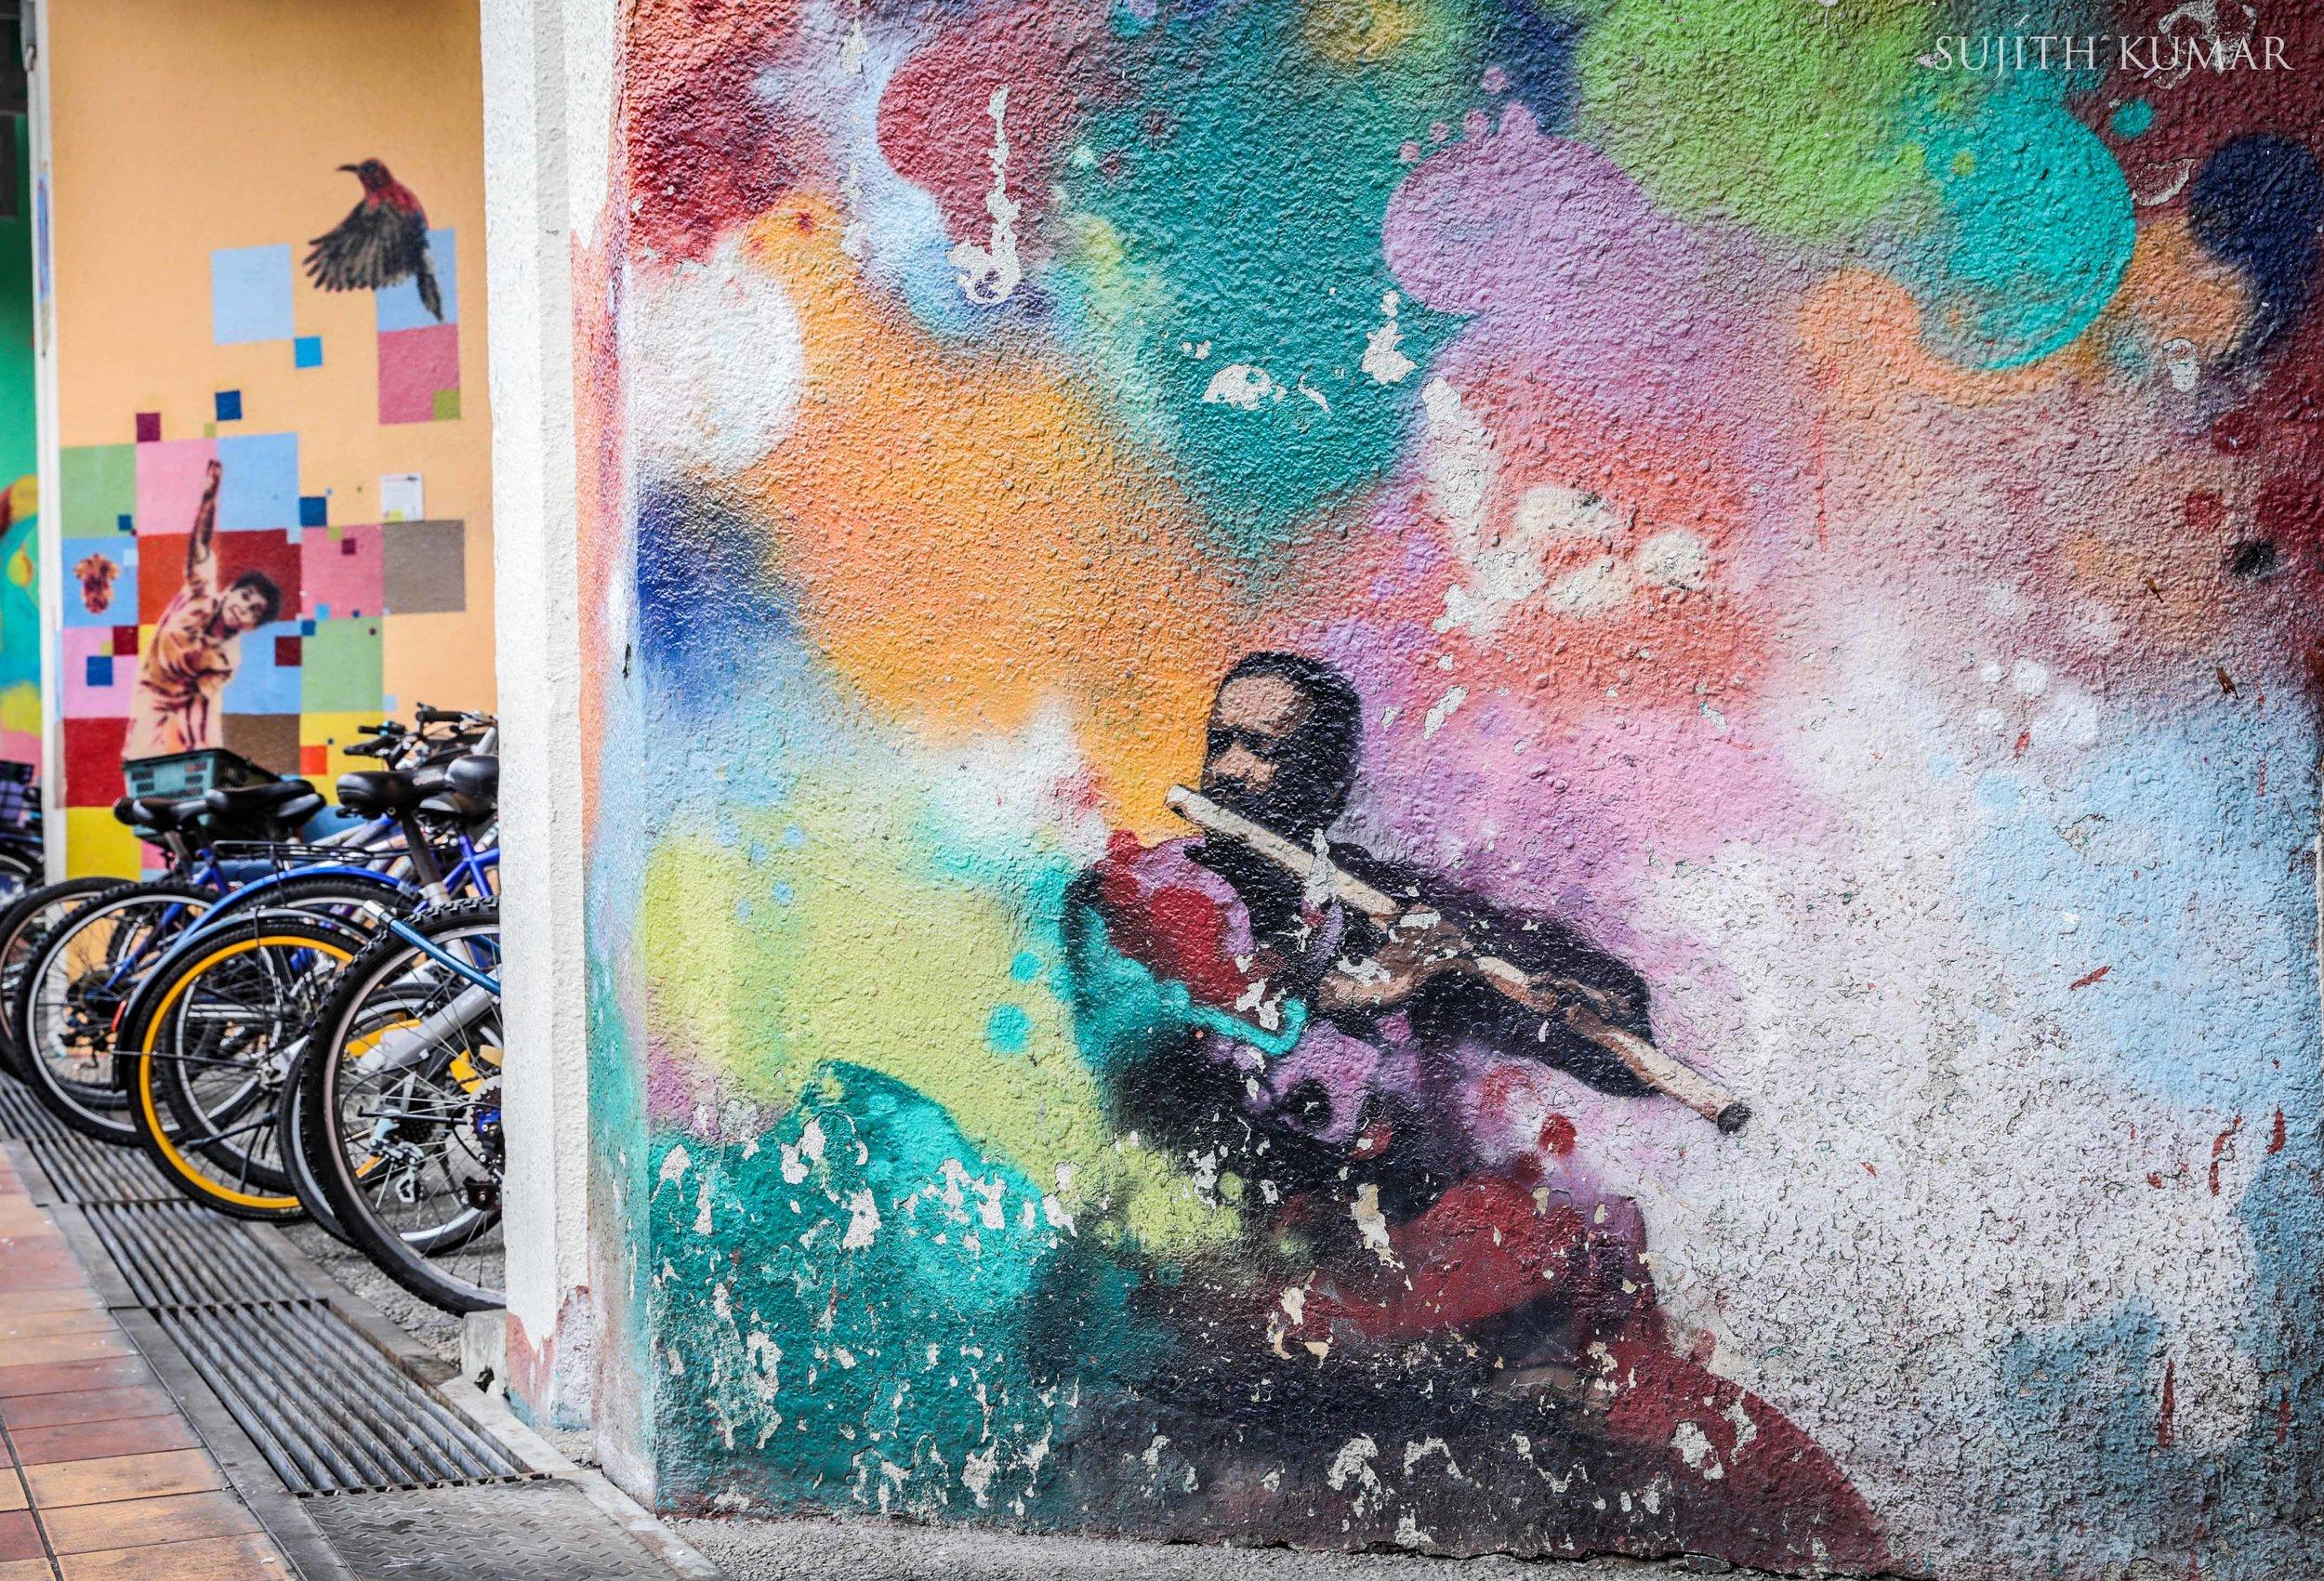 wall-murals-singapore.jpg